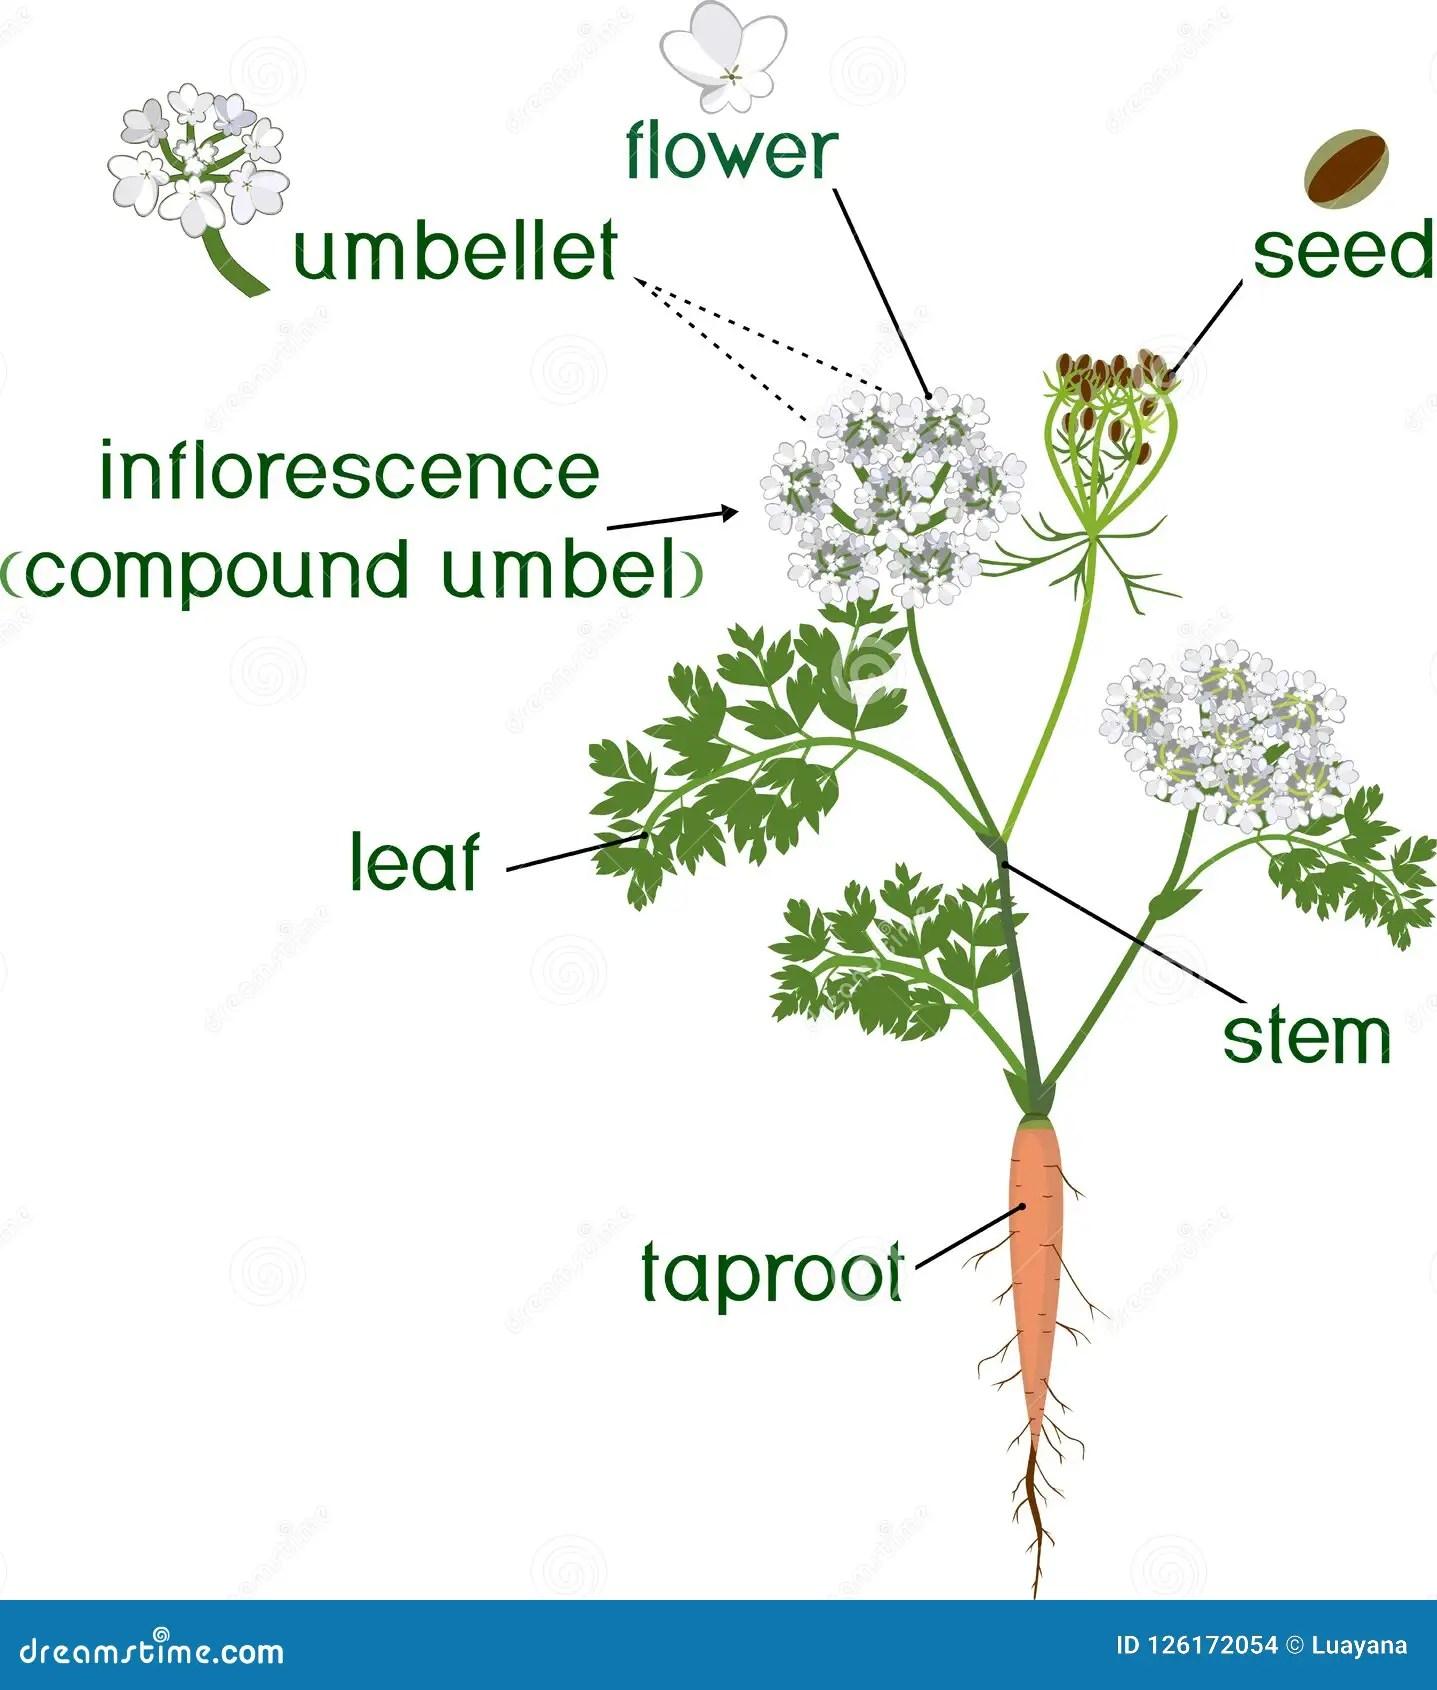 morphology tree diagram winnebago wiring diagrams taproot cartoons illustrations and vector stock images